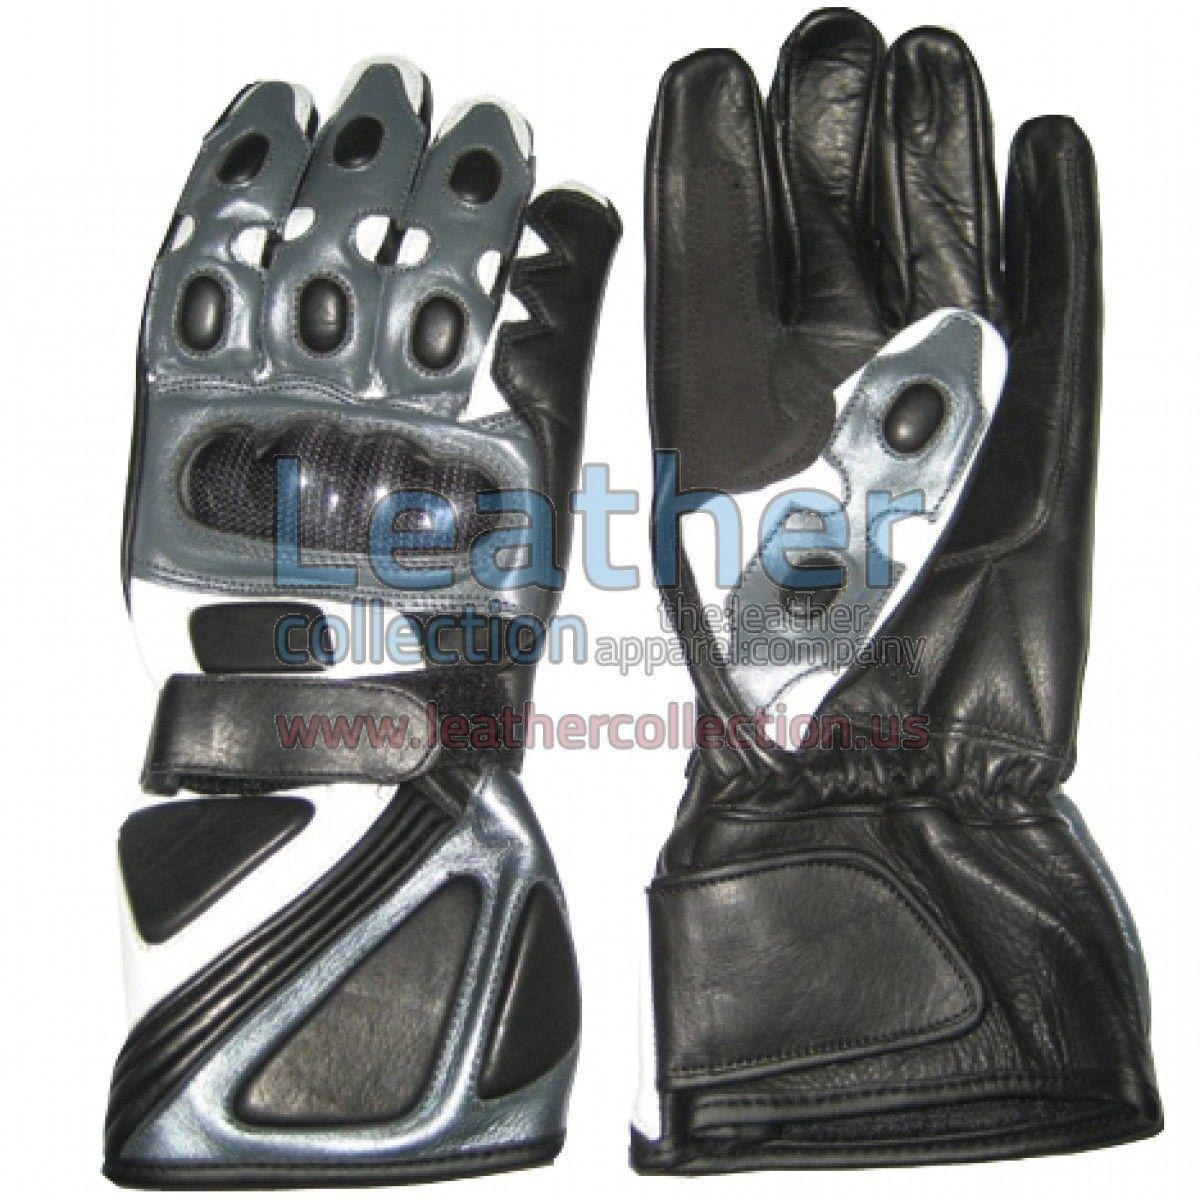 Bravo Grey Motorbike Race Gloves - https://www.leathercollection.us/en-we/bravo-grey-motorbike-race-gloves.html motorbike race gloves, Race Gloves #MotorbikeRaceGloves, #RaceGloves